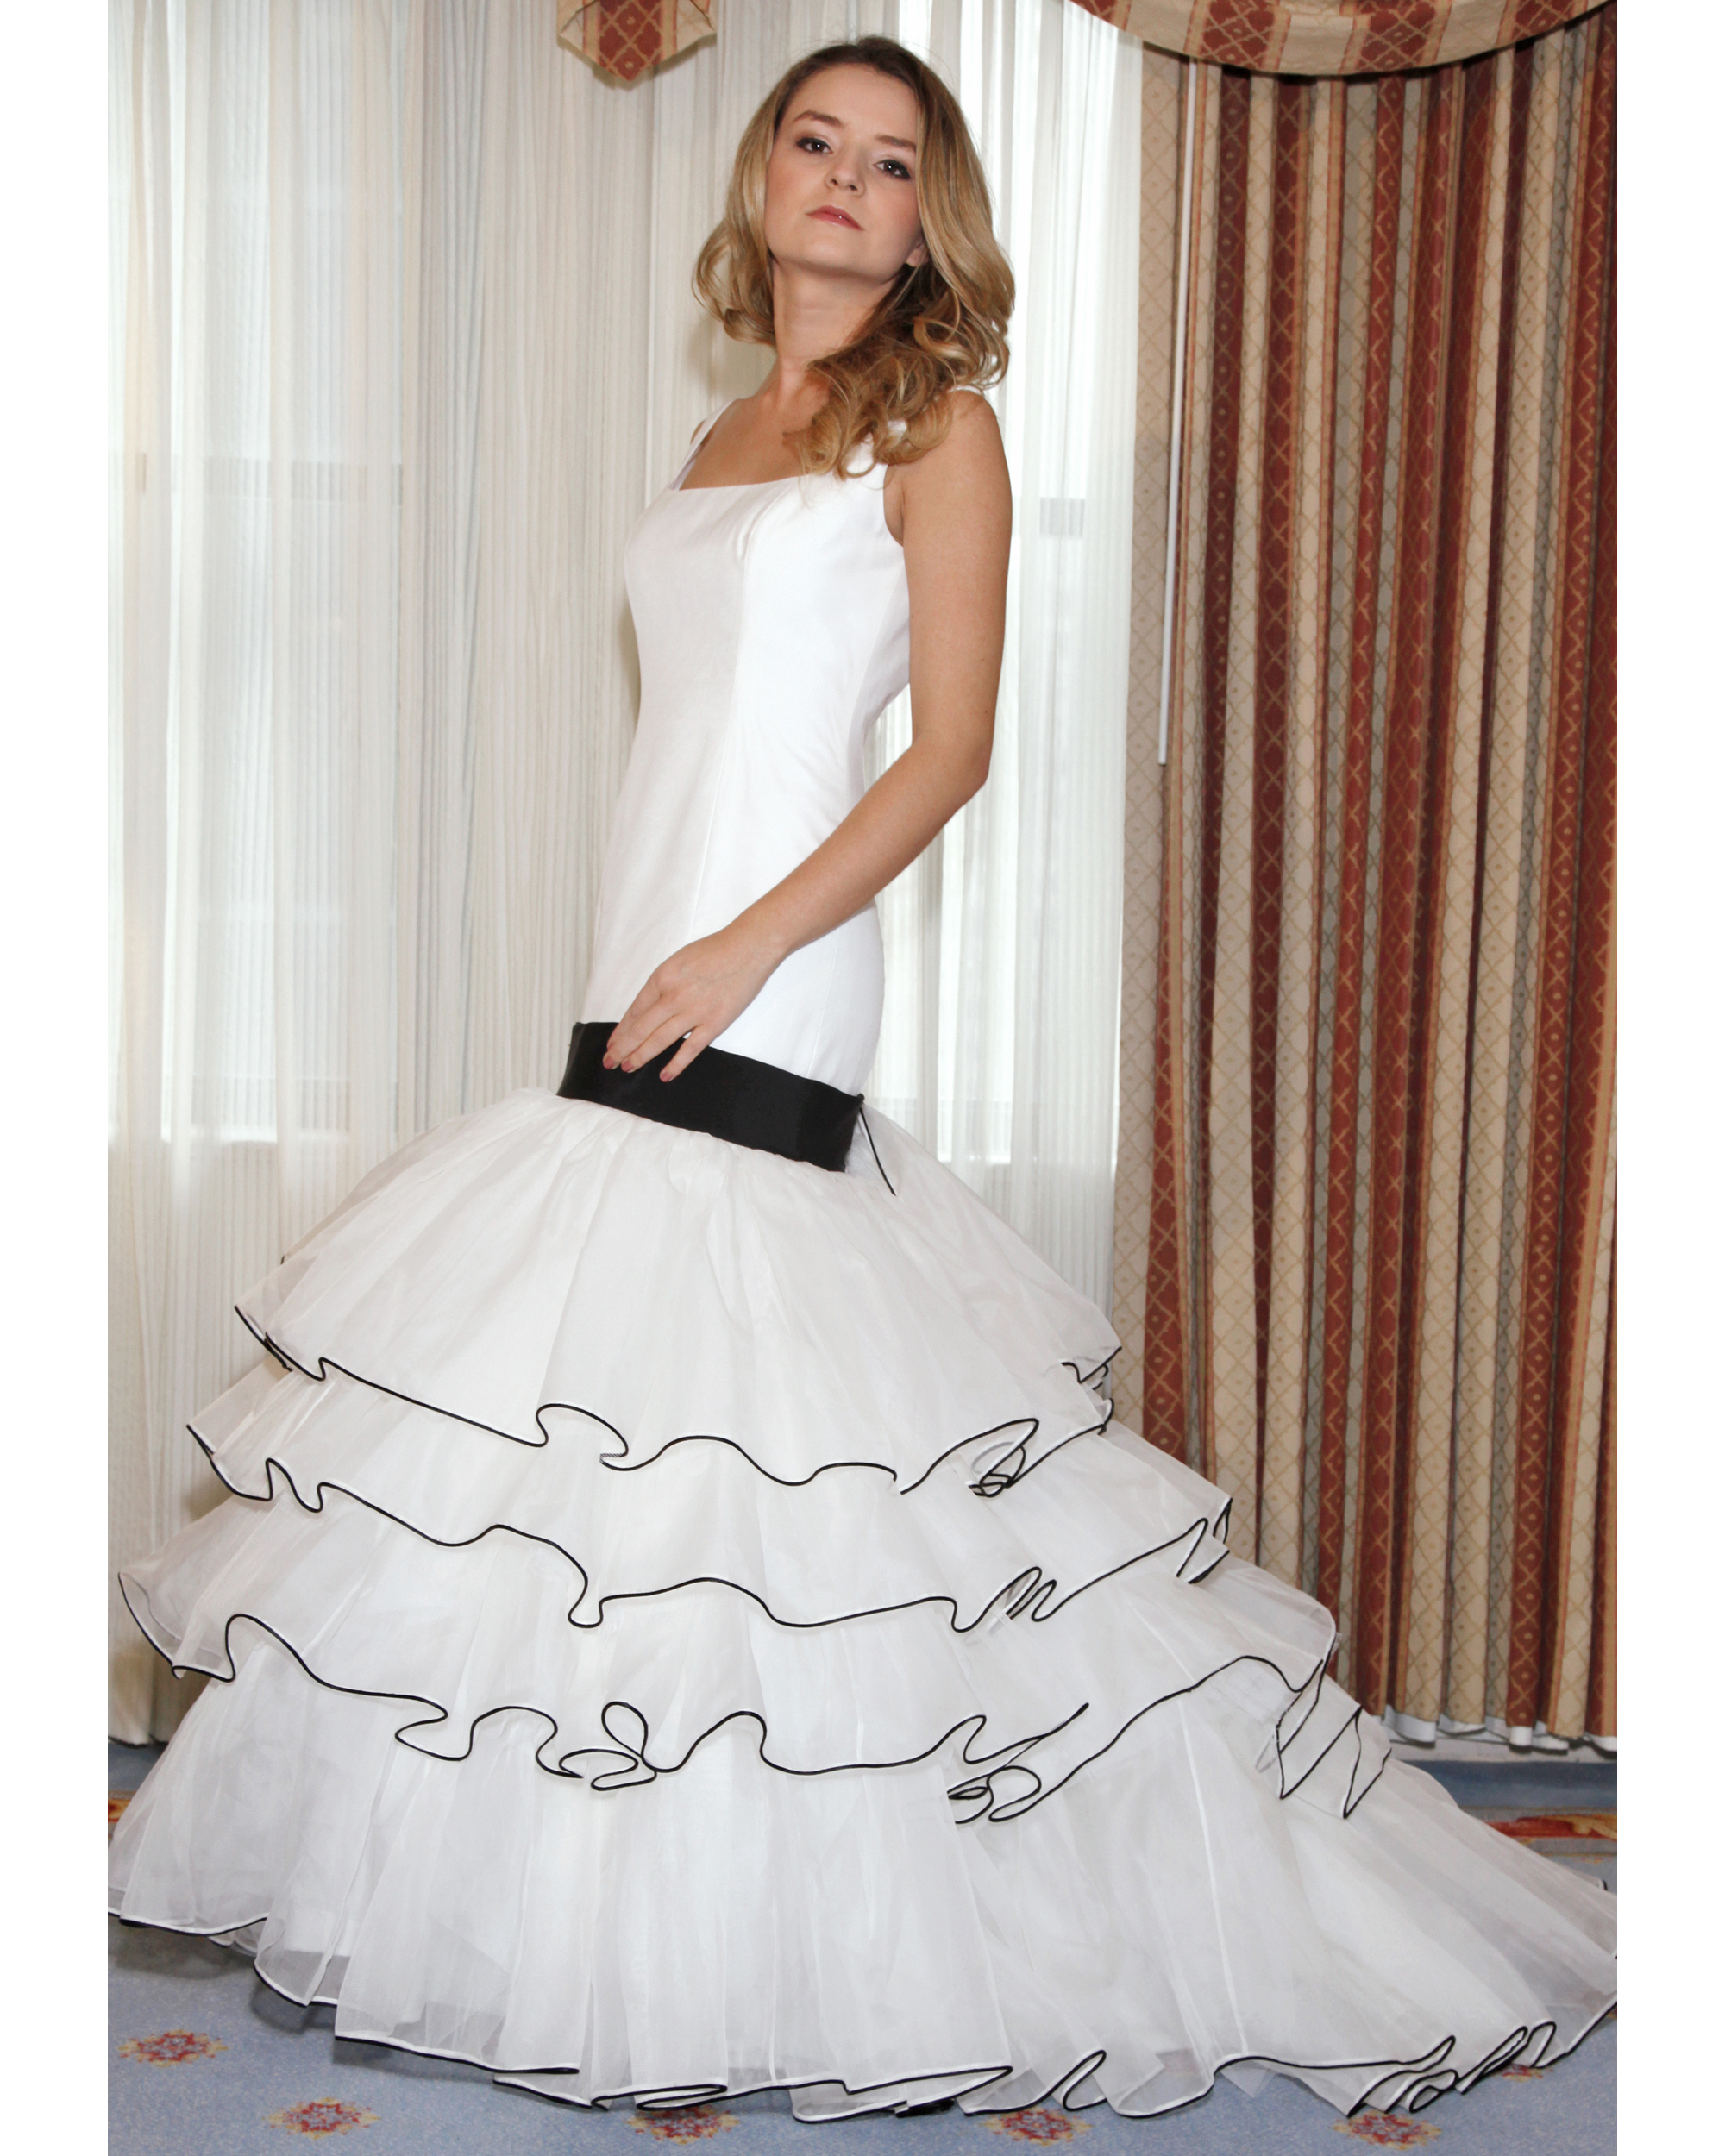 karen-hendrix-couture-fall2012-wd108109-004.jpg